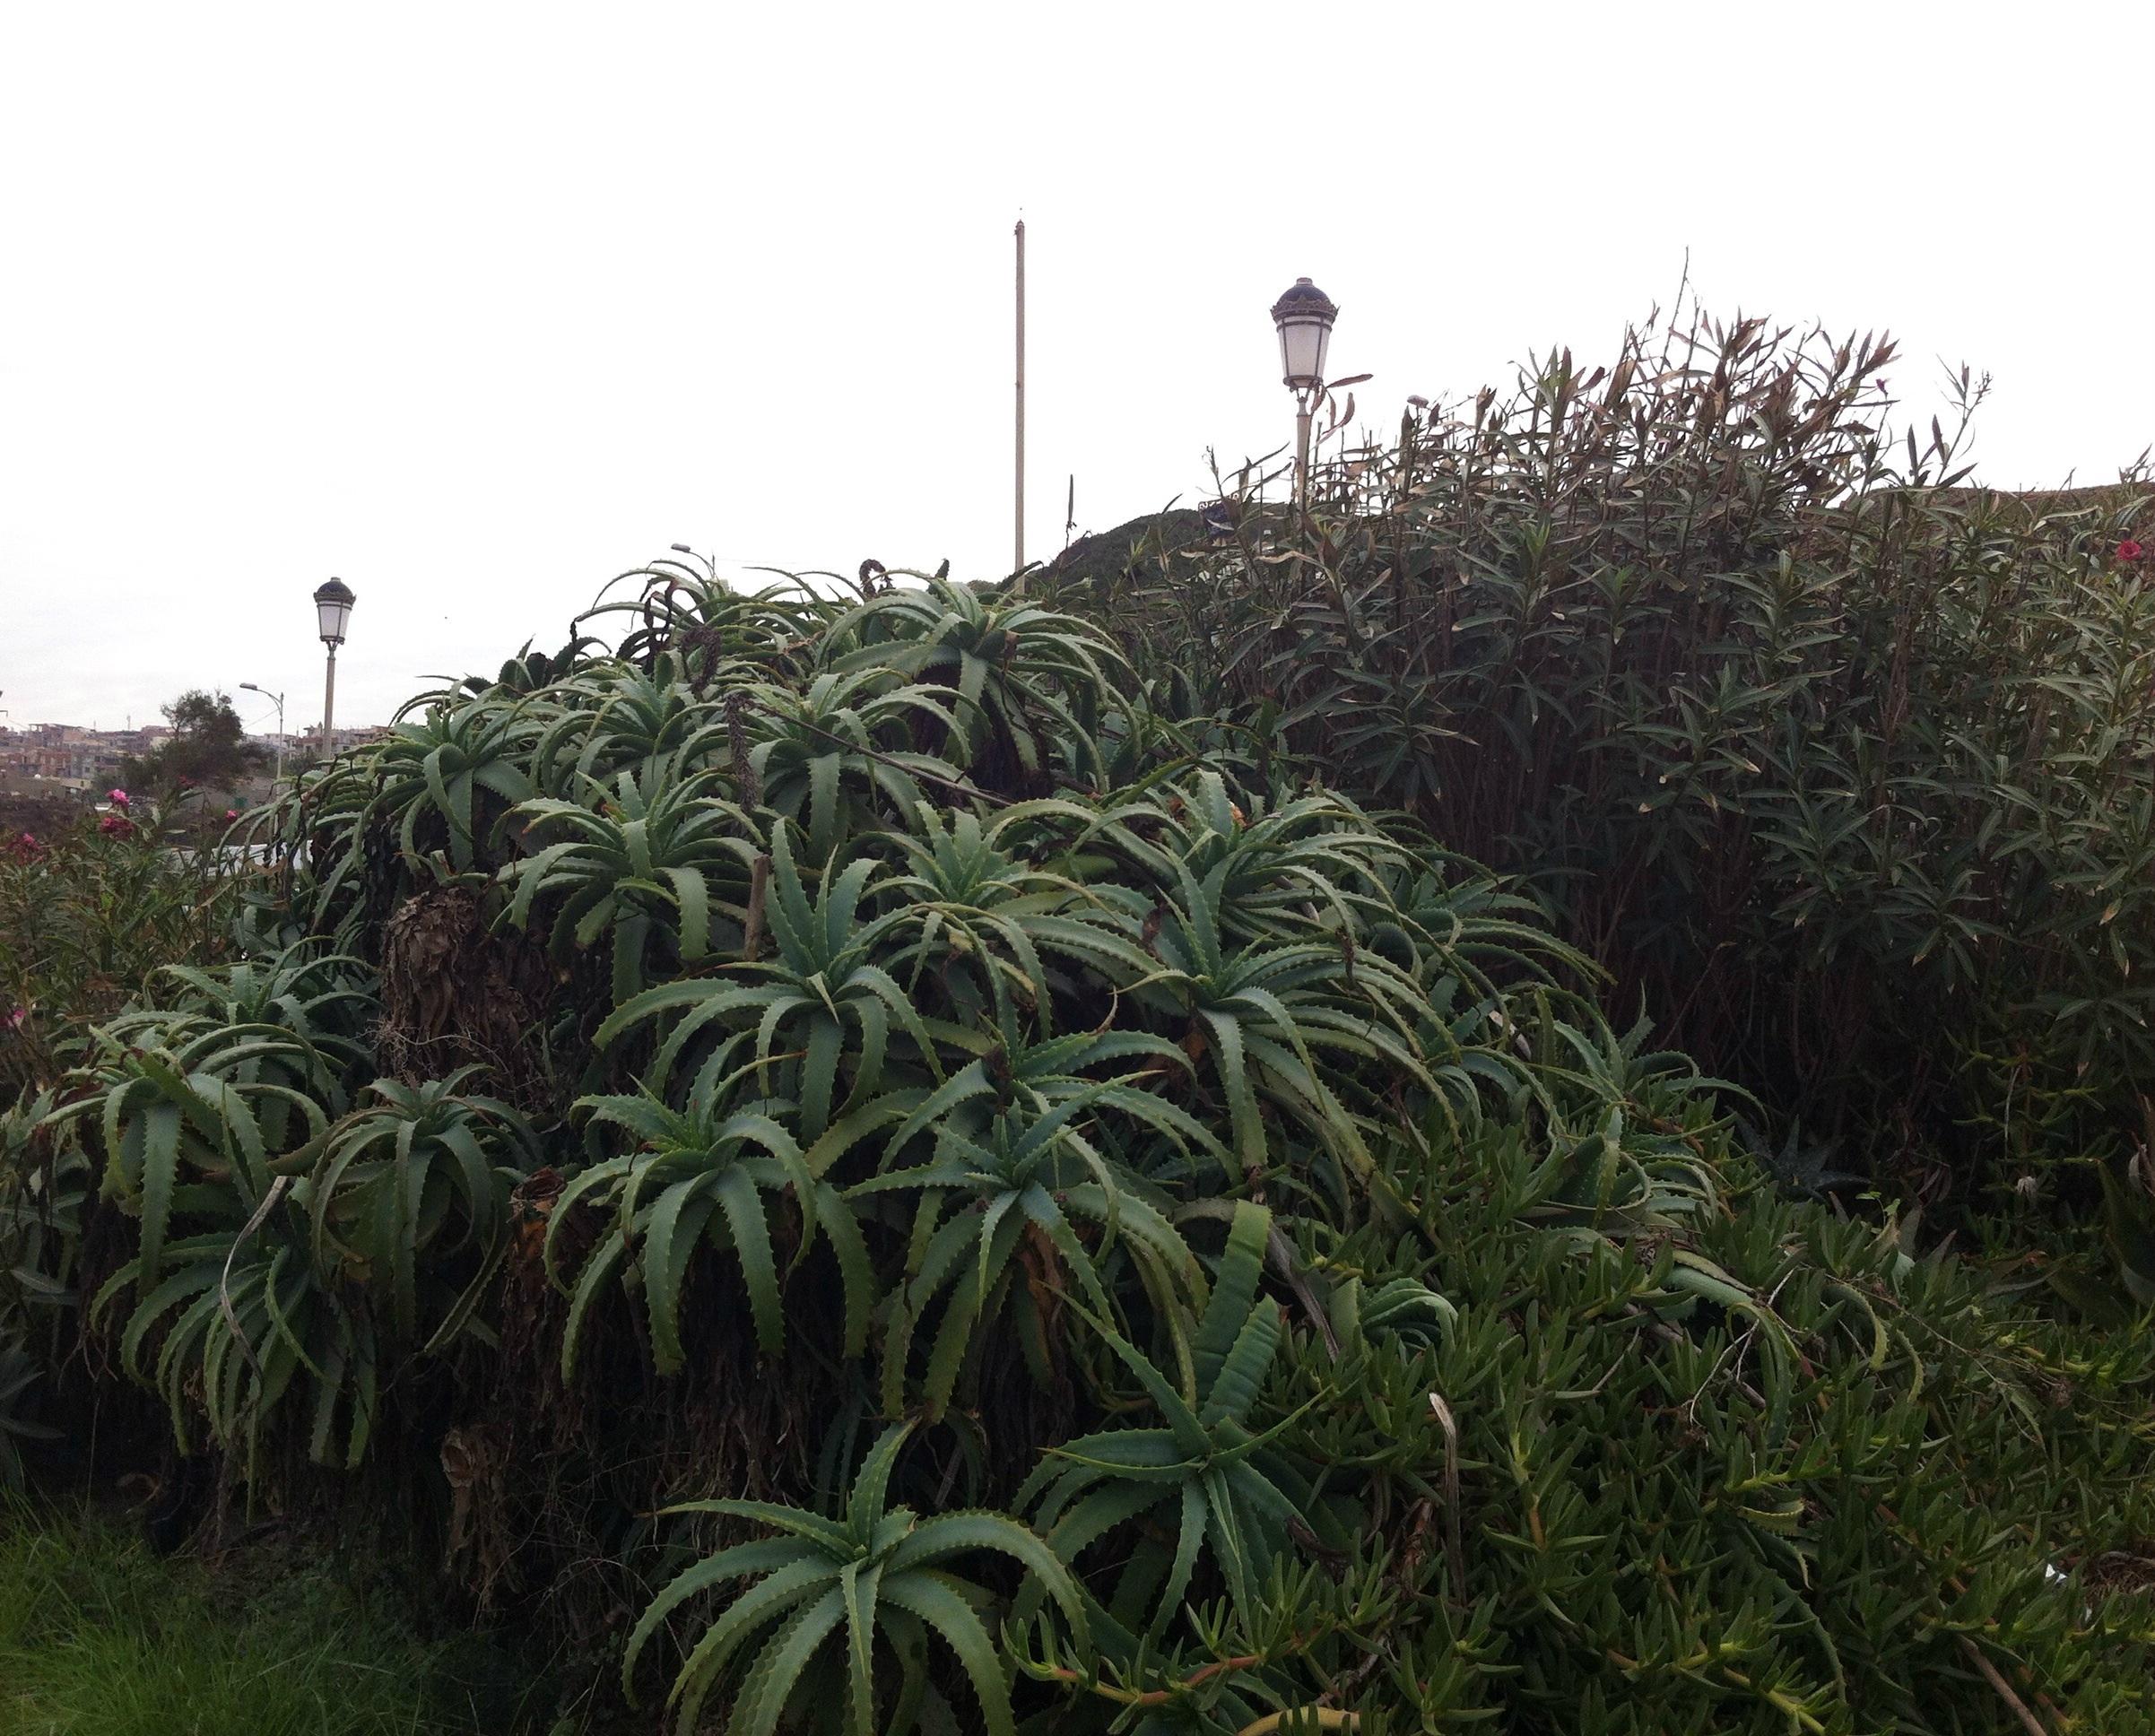 Image Plante Aloe Vera file:plante aloe vera -aïn benian - panoramio